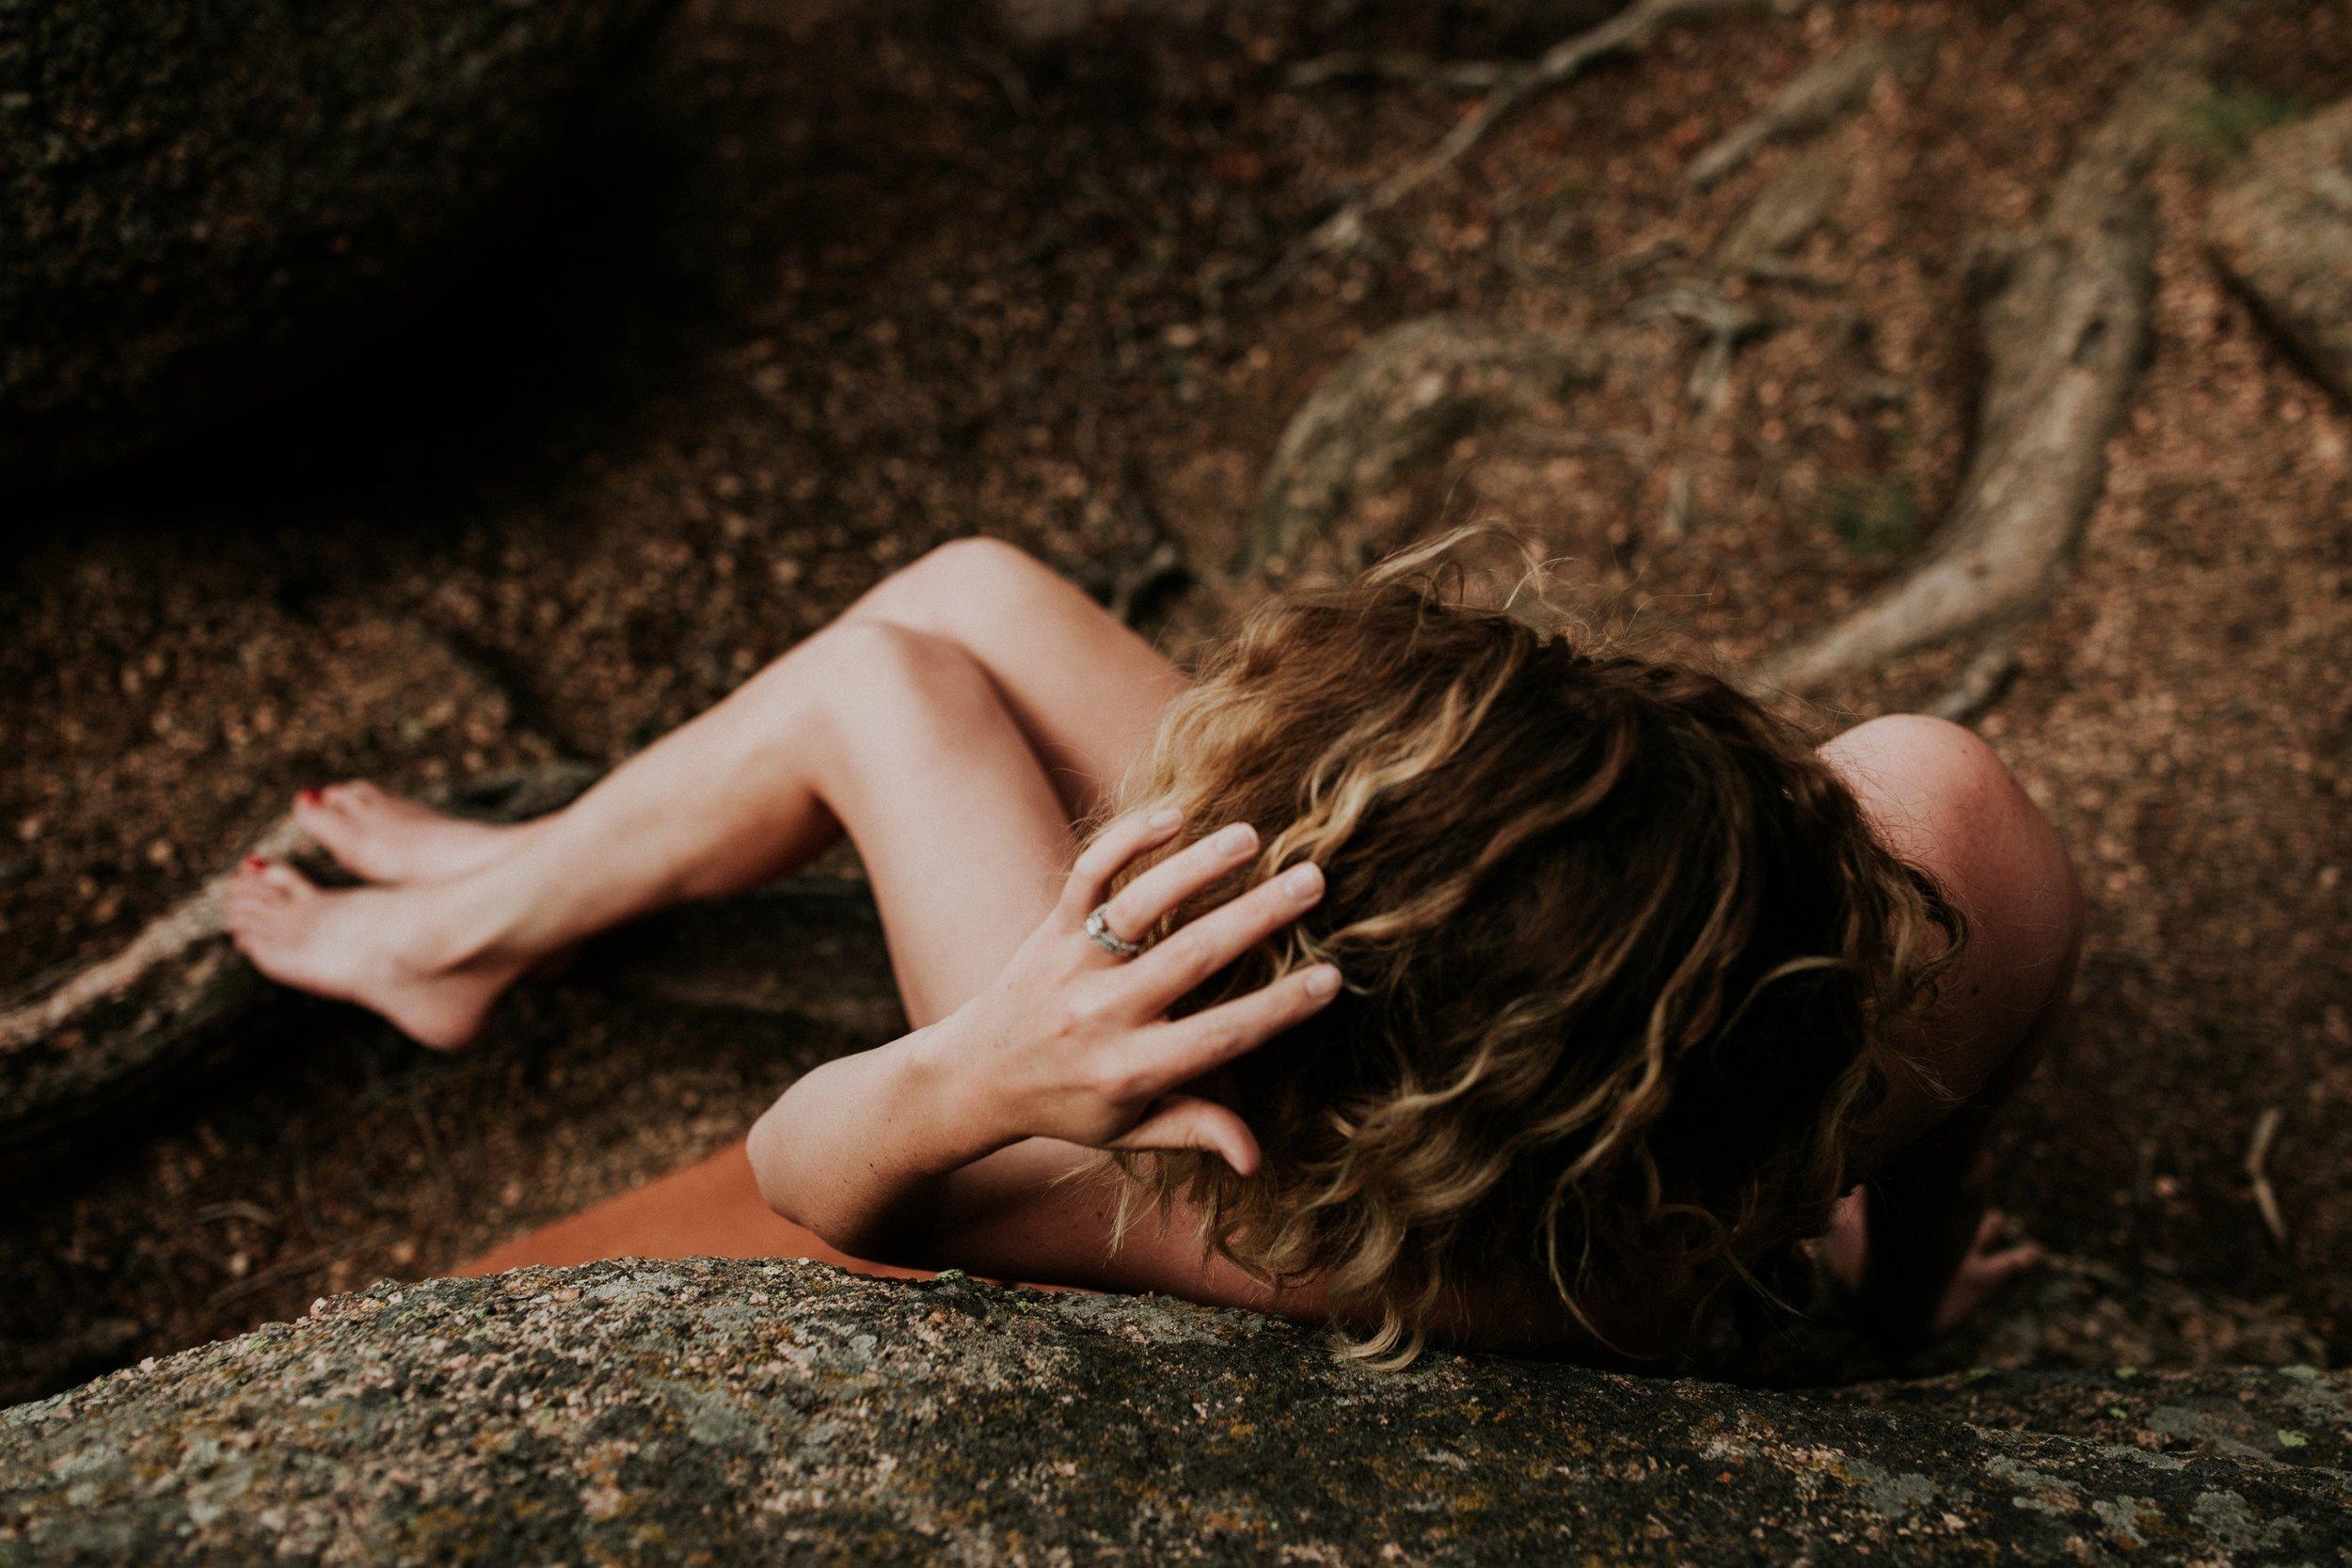 colorado-boudoir-photographer-vedauwoo-soul-session-jessica-max-058.jpg